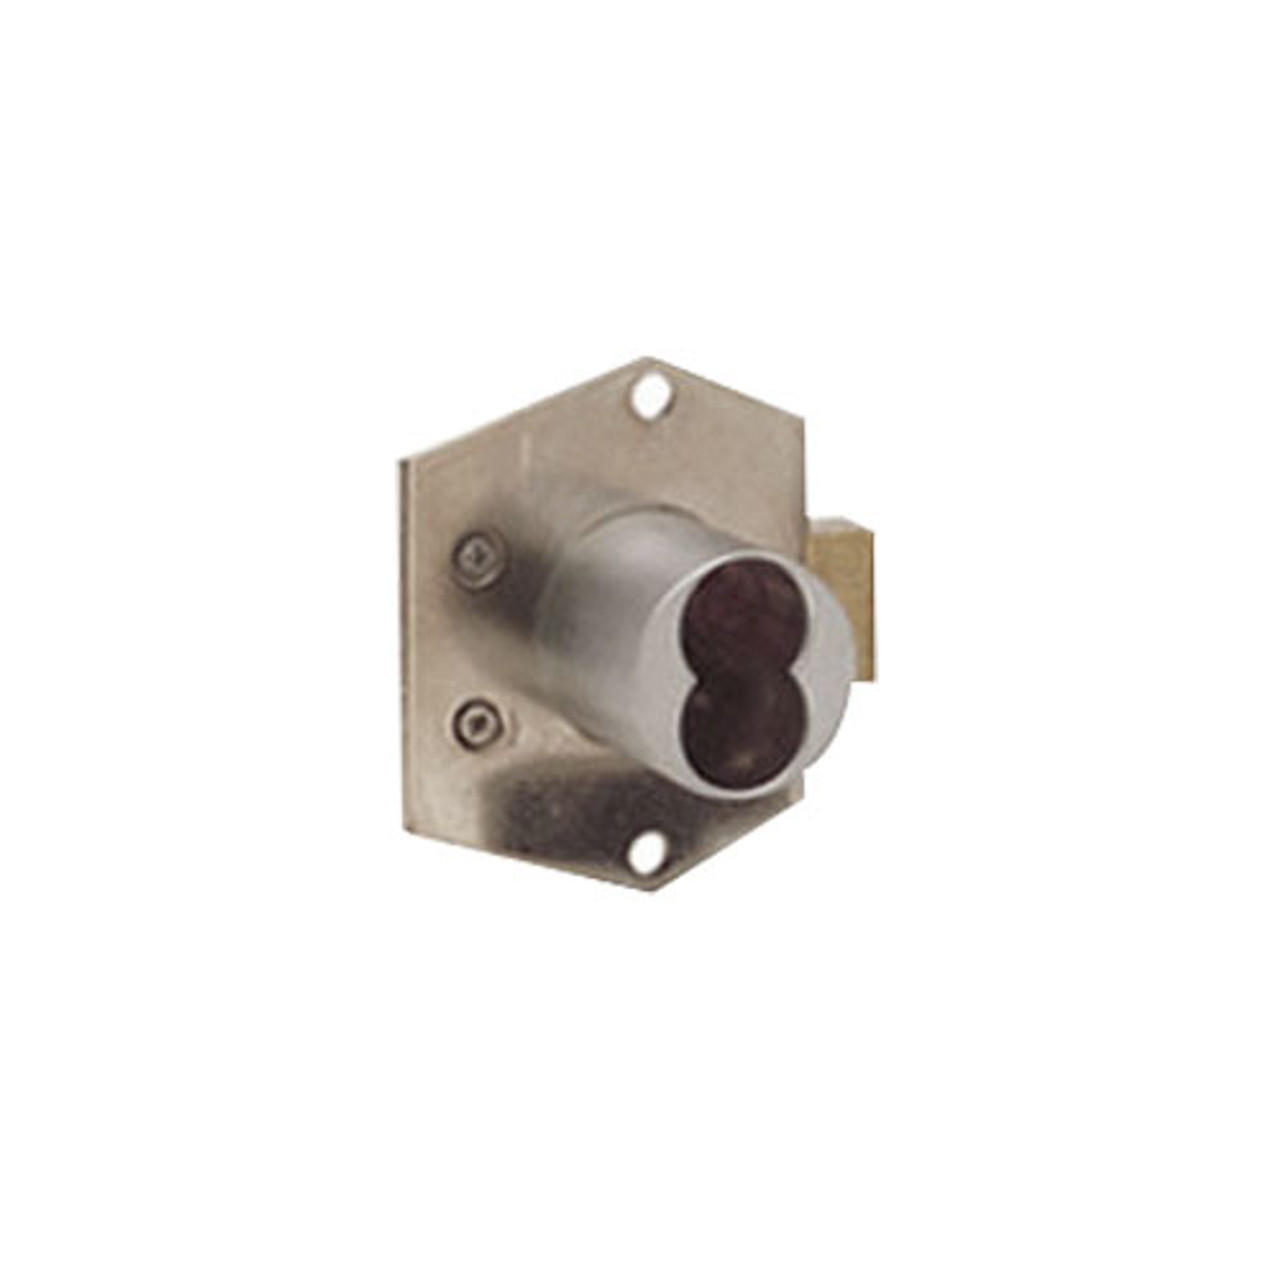 Olympus 725RD-DR-LH-26D Rim Mount Deadbolt Cabinet Locks in Satin Chrome Finish